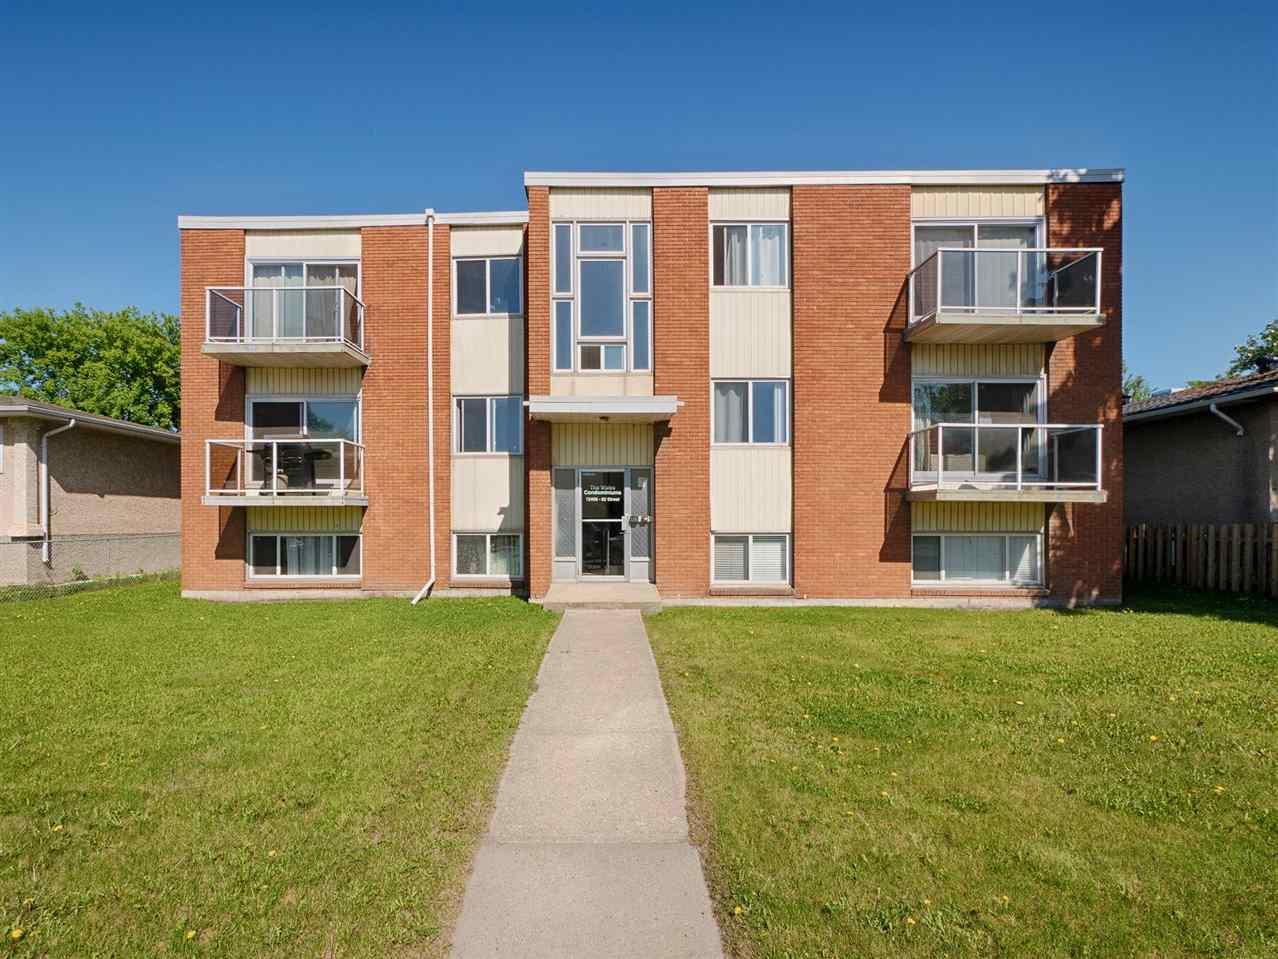 201 12409 82 Street, 1 bed, 1 bath, at $75,000